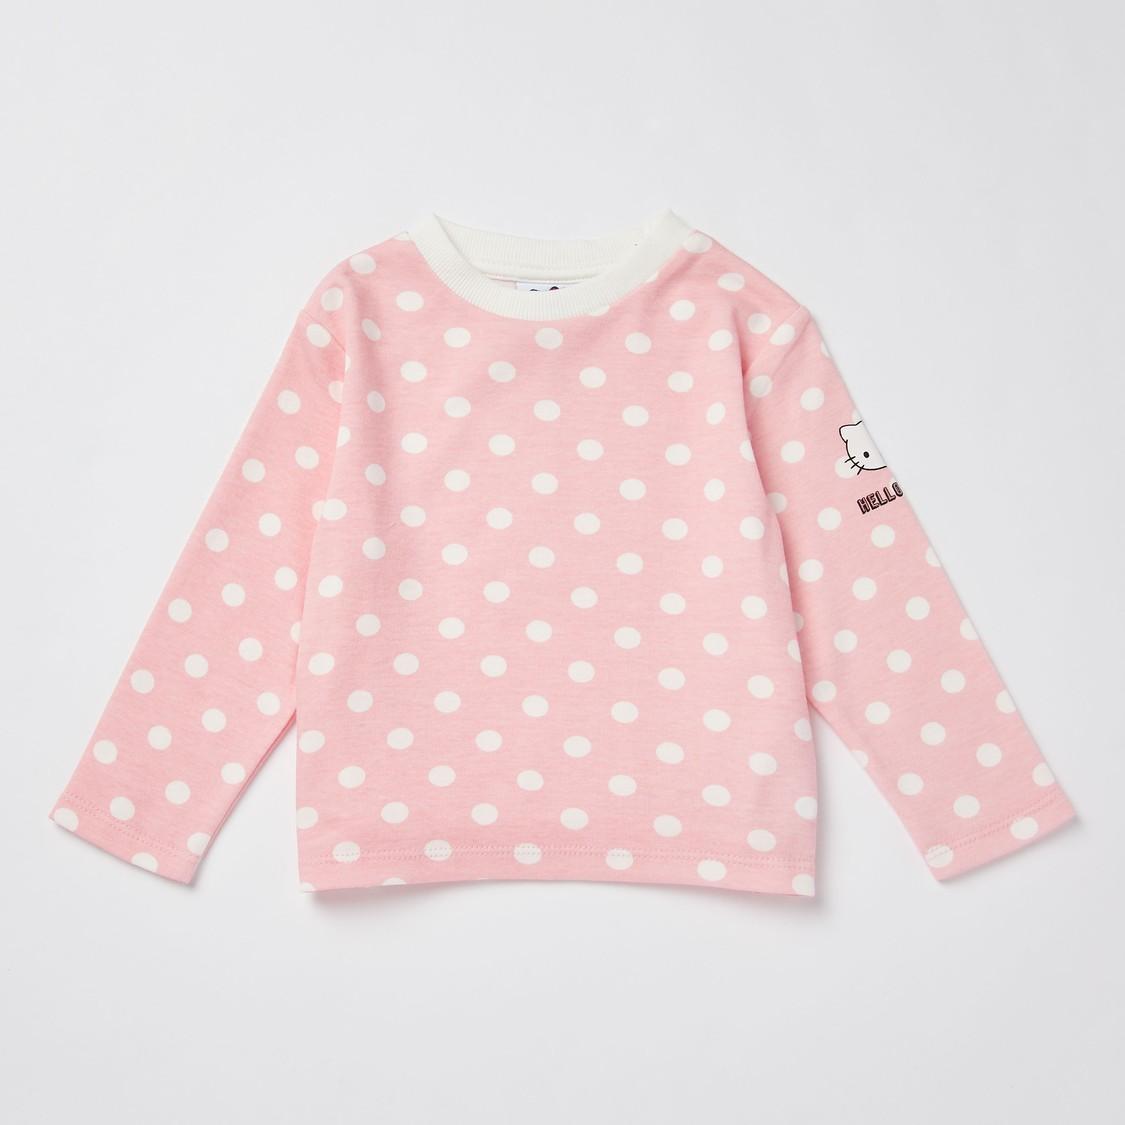 Hello Kitty Print Full Length Dungarees and Long Sleeves T-shirt Set